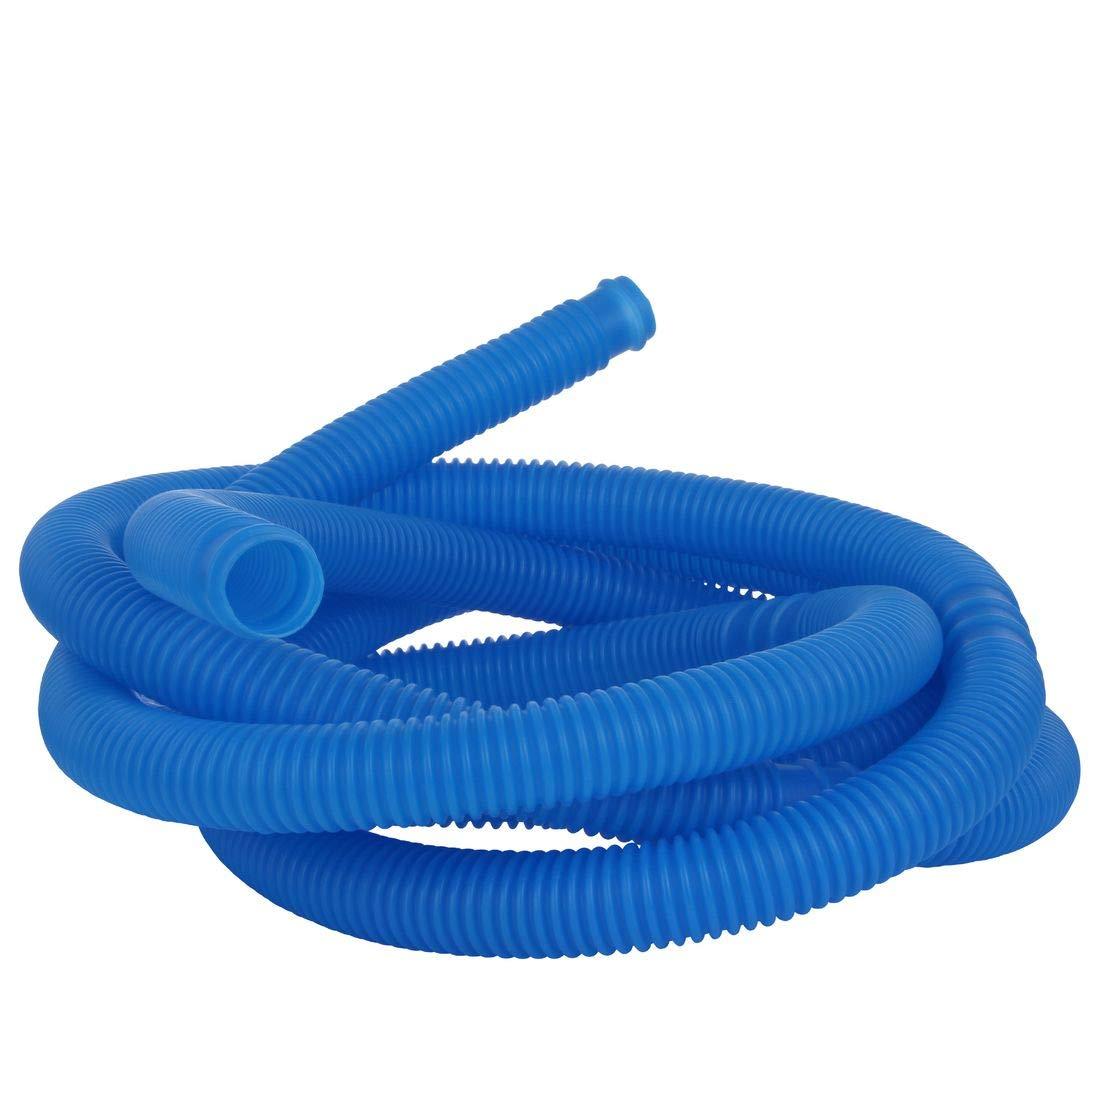 Blueborn Pool Hose PH Diameter 38 mm x 10 m Flexible Suction Hose Separable All 100 cm Blue